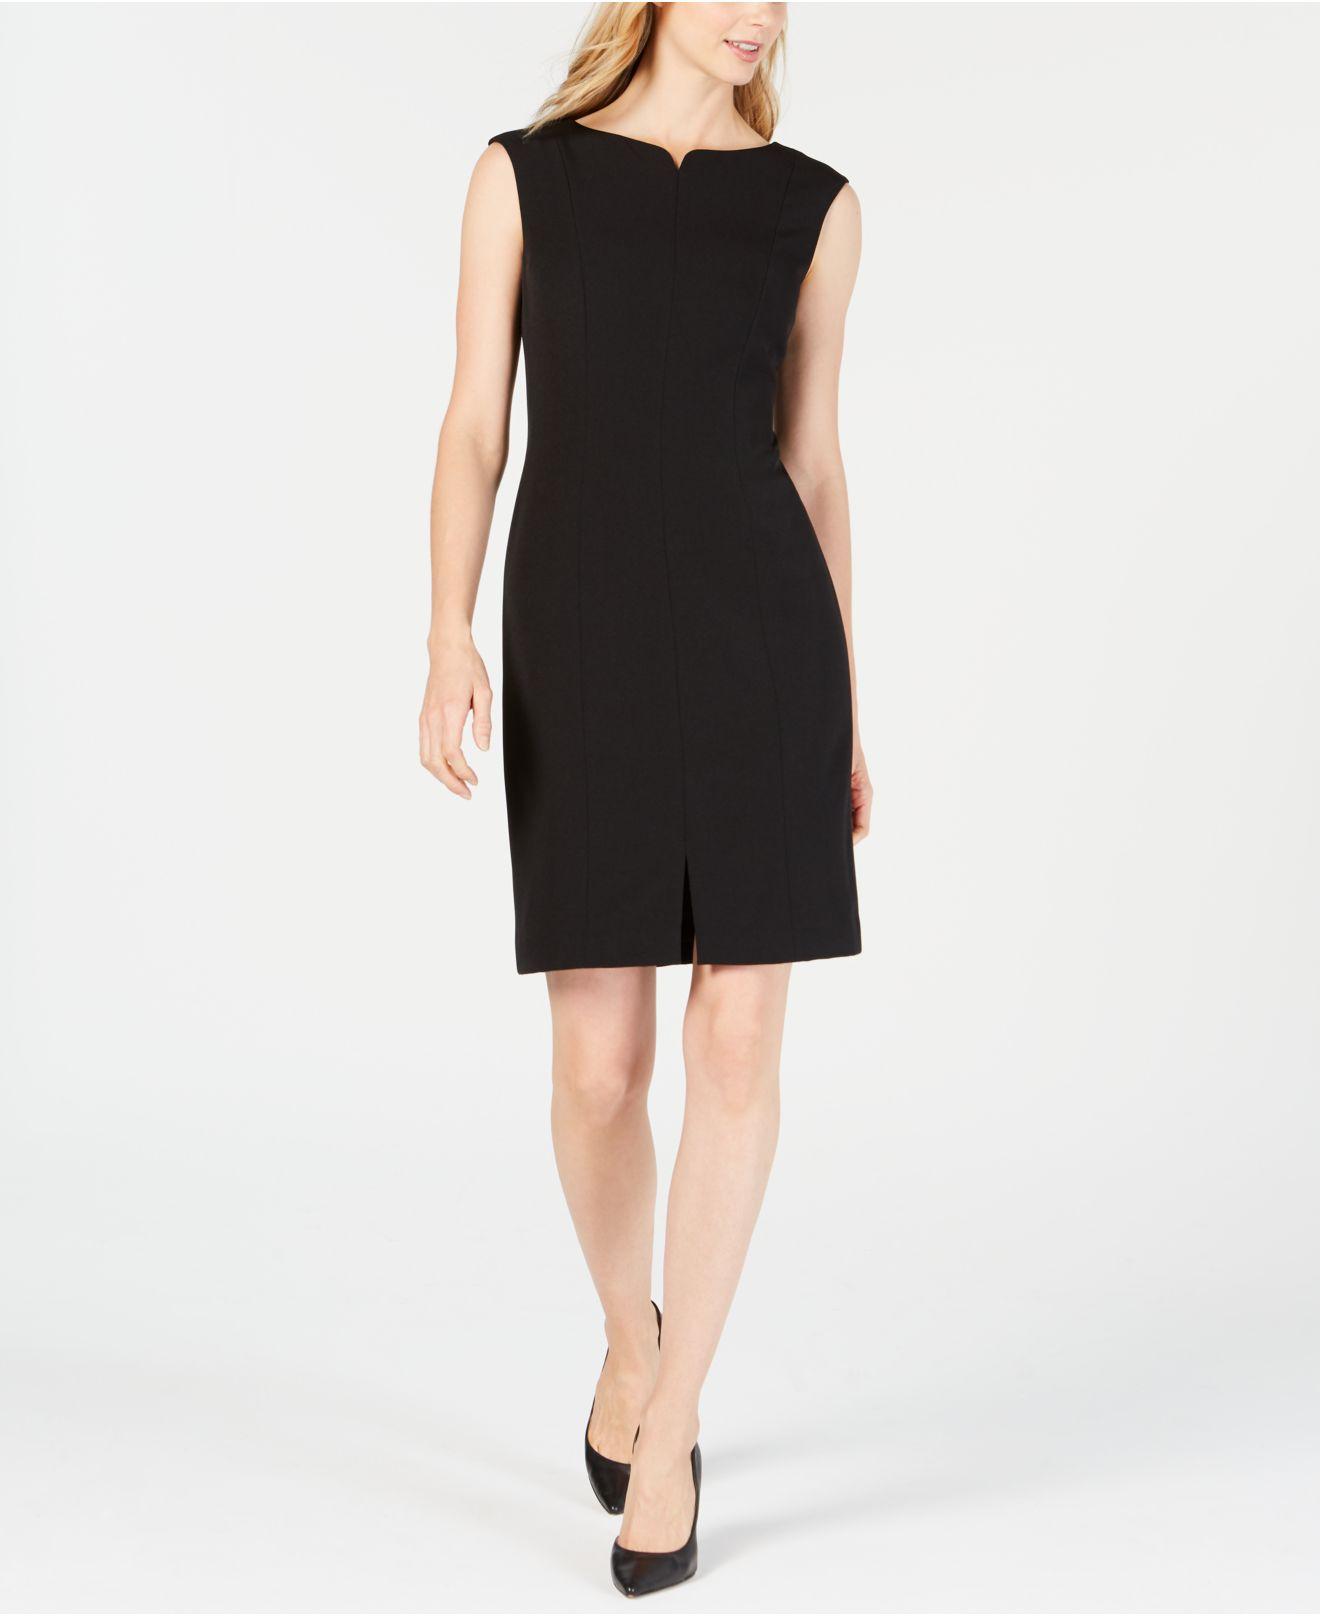 b21c7e0e9aa Lyst - Anne Klein Crepe Sheath Dress in Black